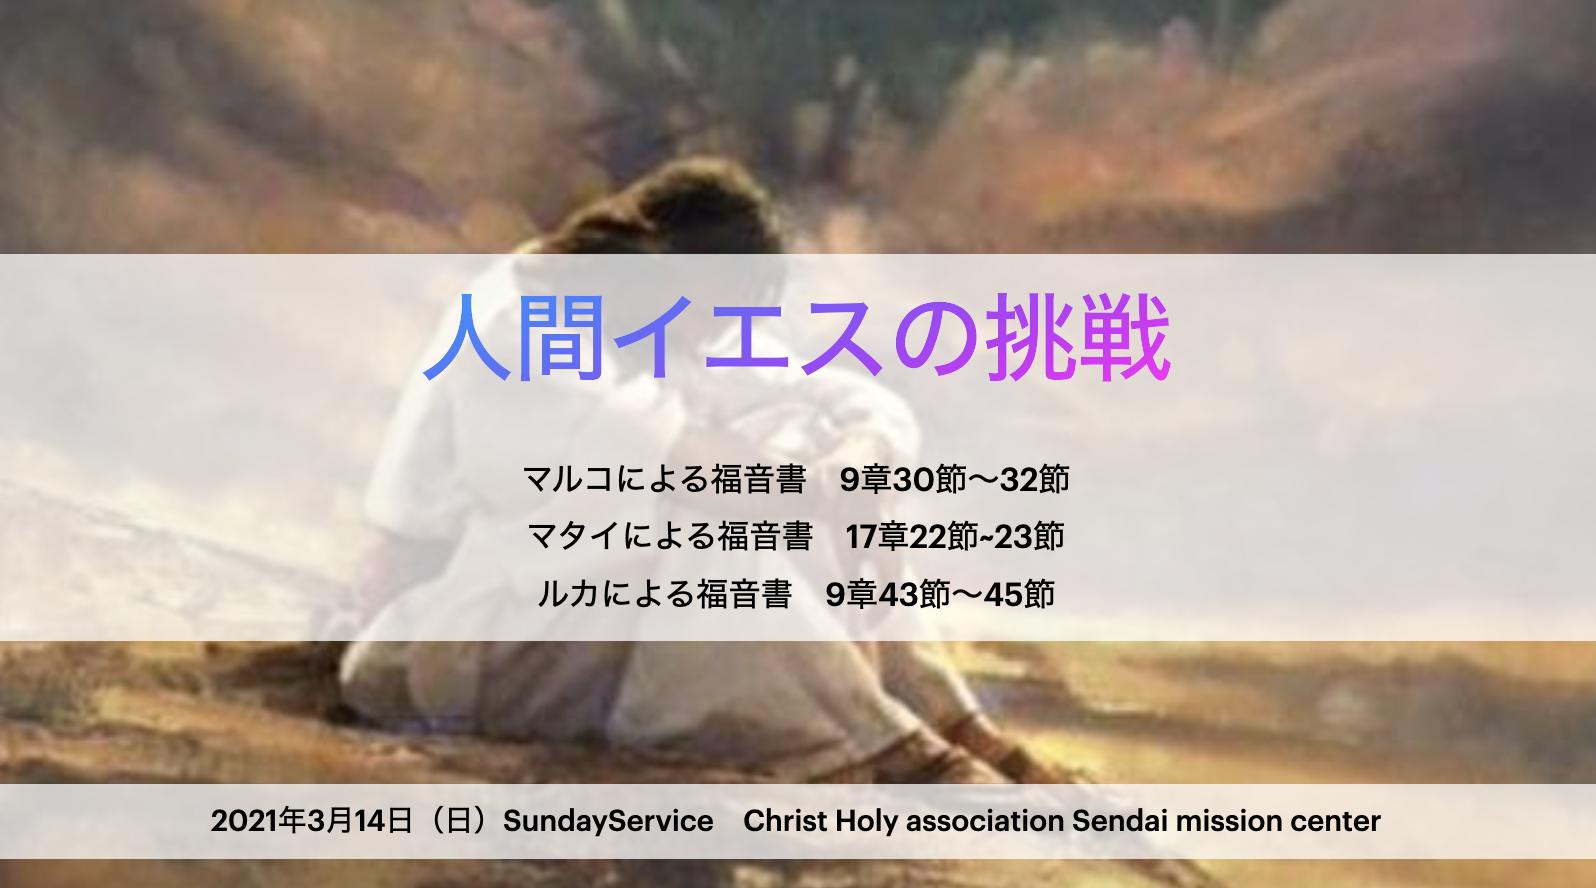 2021年3月14日(日)SundayService